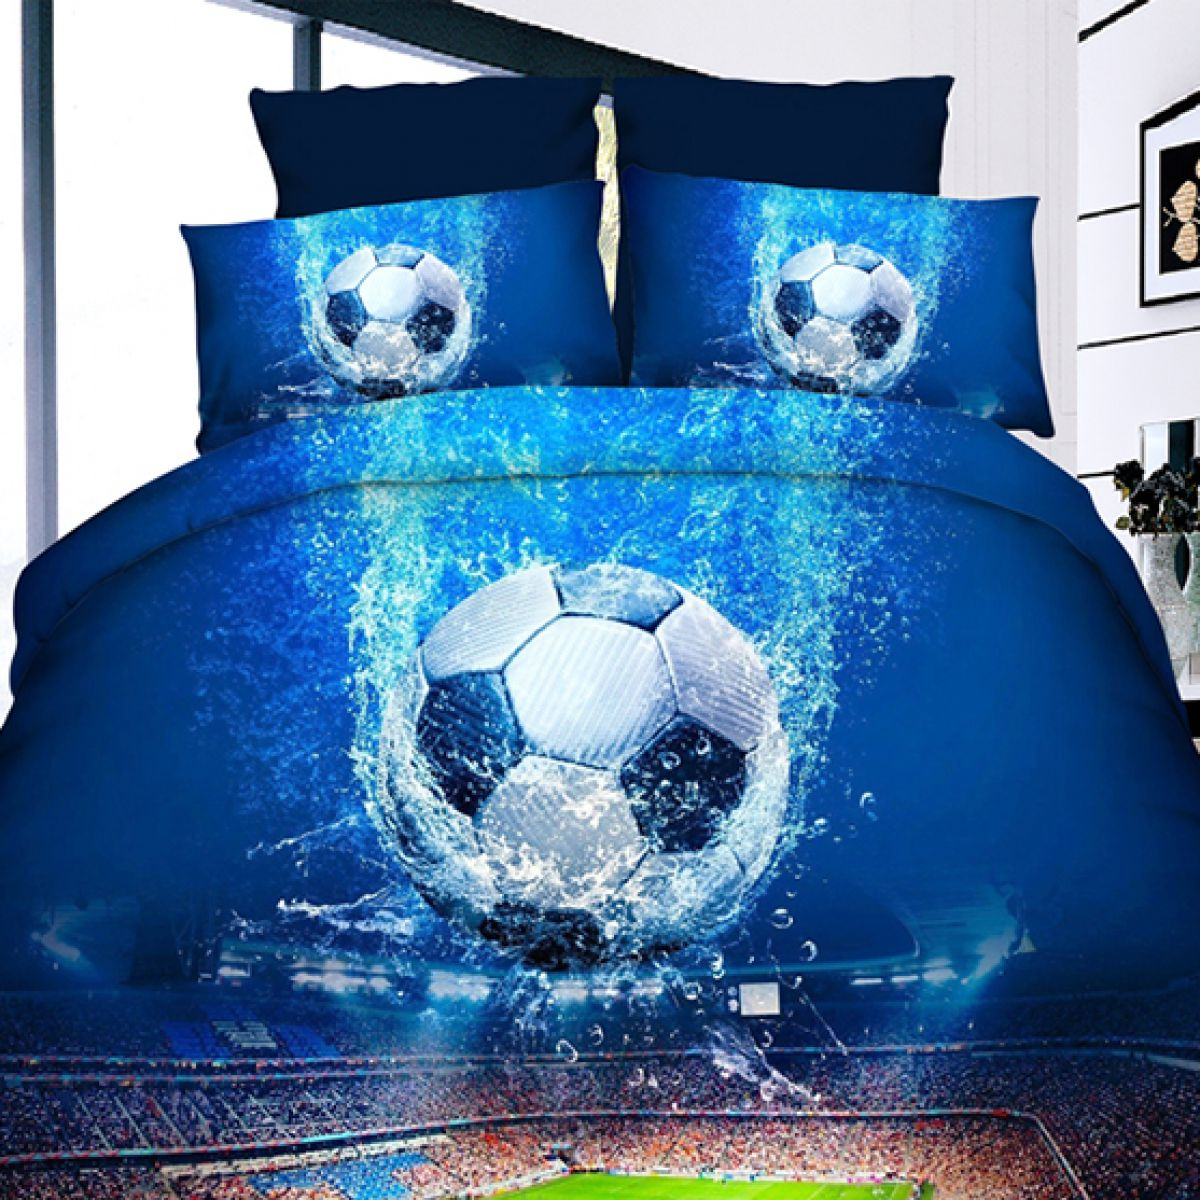 3D Beddings - Antonio - AML-121 - 160x200 cm - 4 pcs